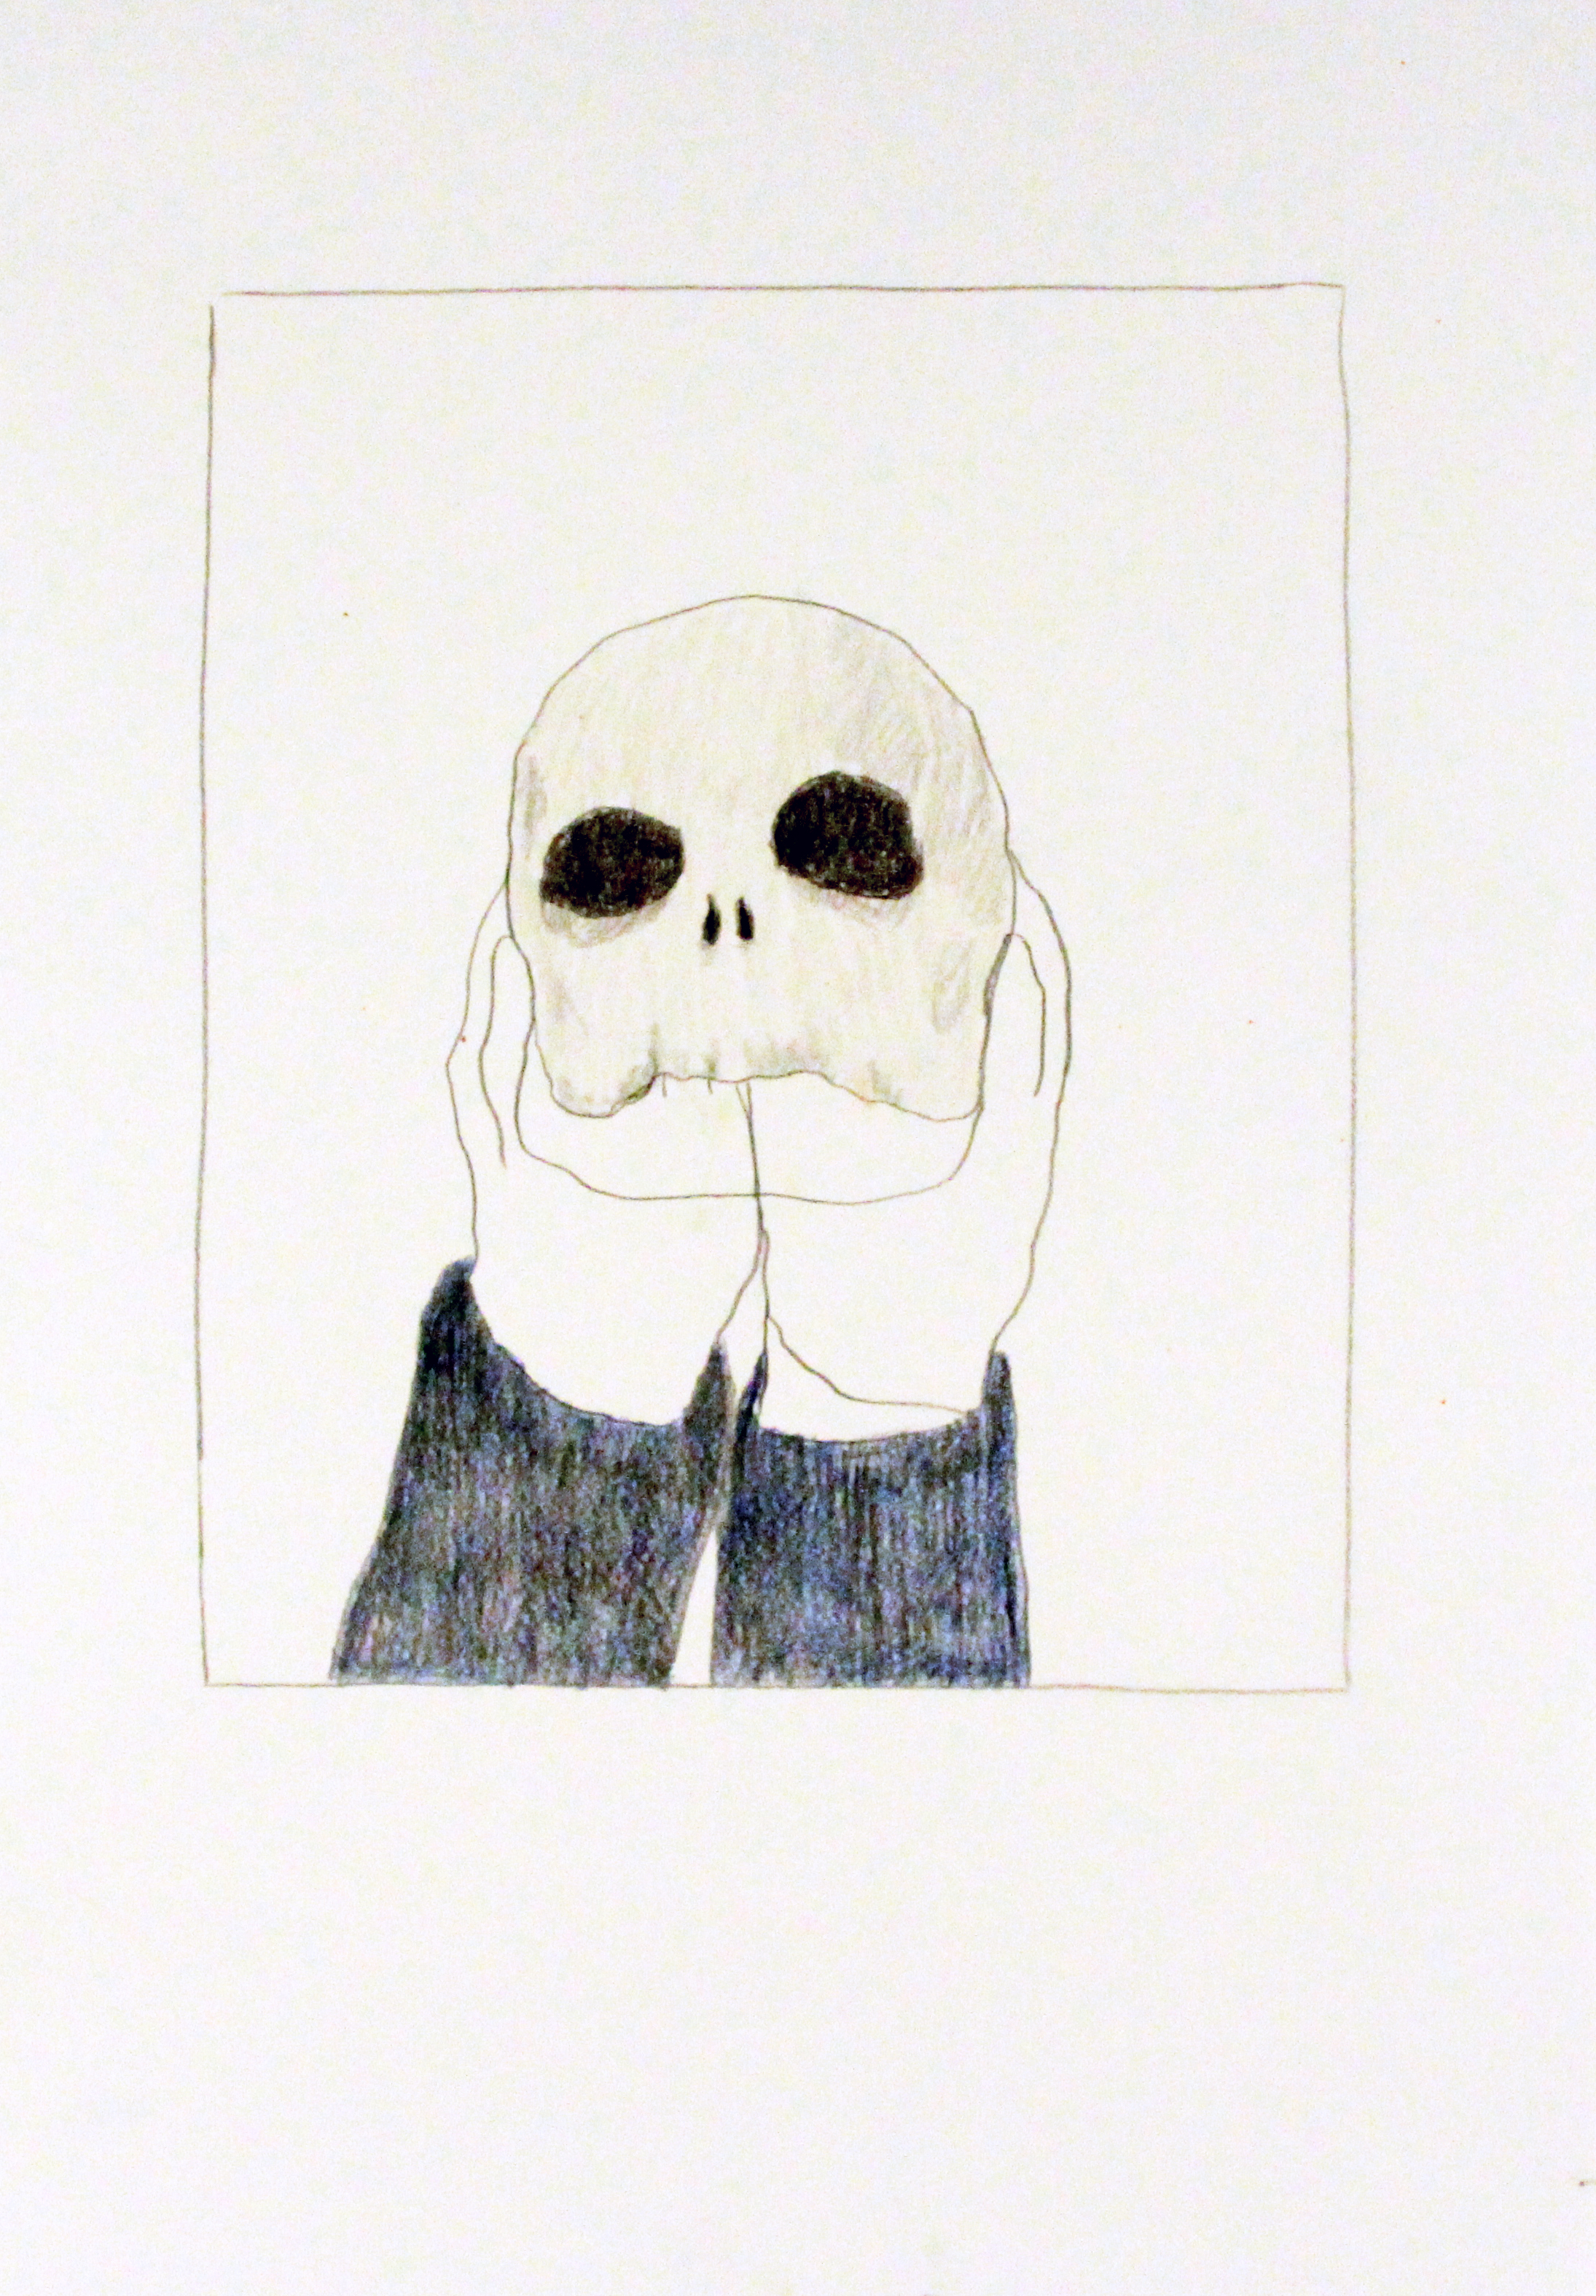 'Skull', Pencil on paper, 42x29cm